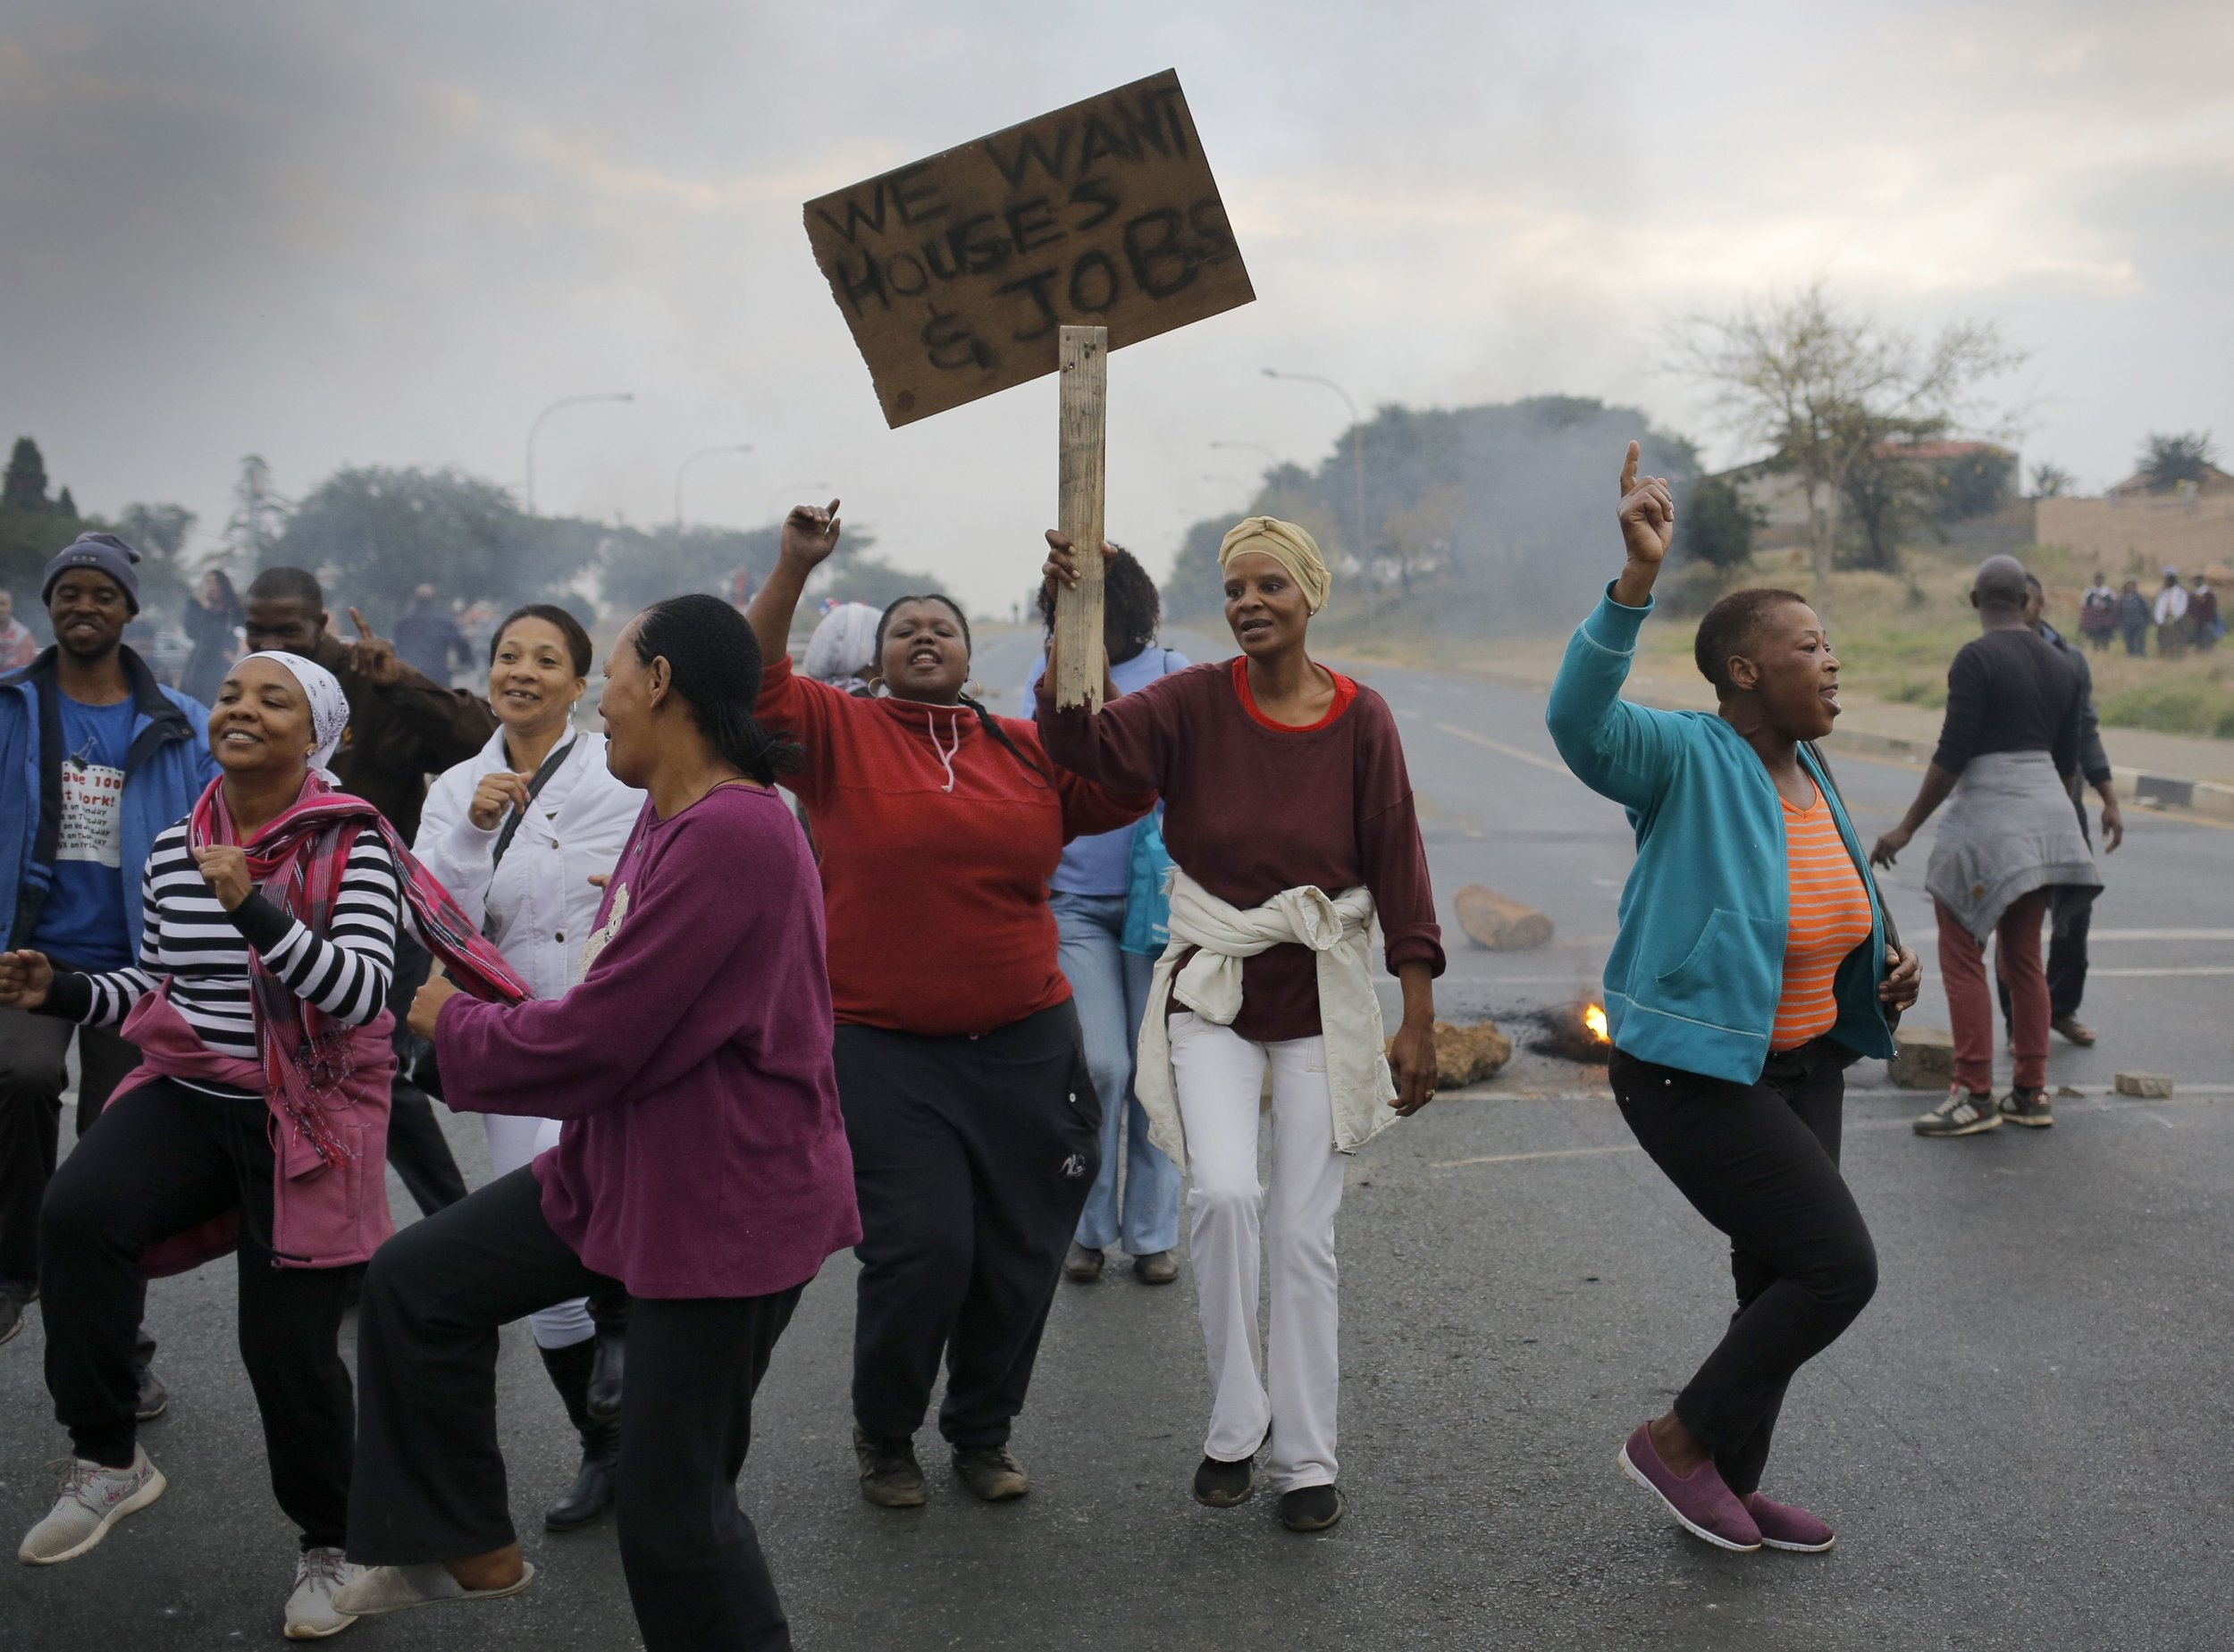 RESIDENTS OF ELDORADO PARK PROTESTING. CREDIT: KIM LUDBROOK/EPA/SHUTTERSTOCK